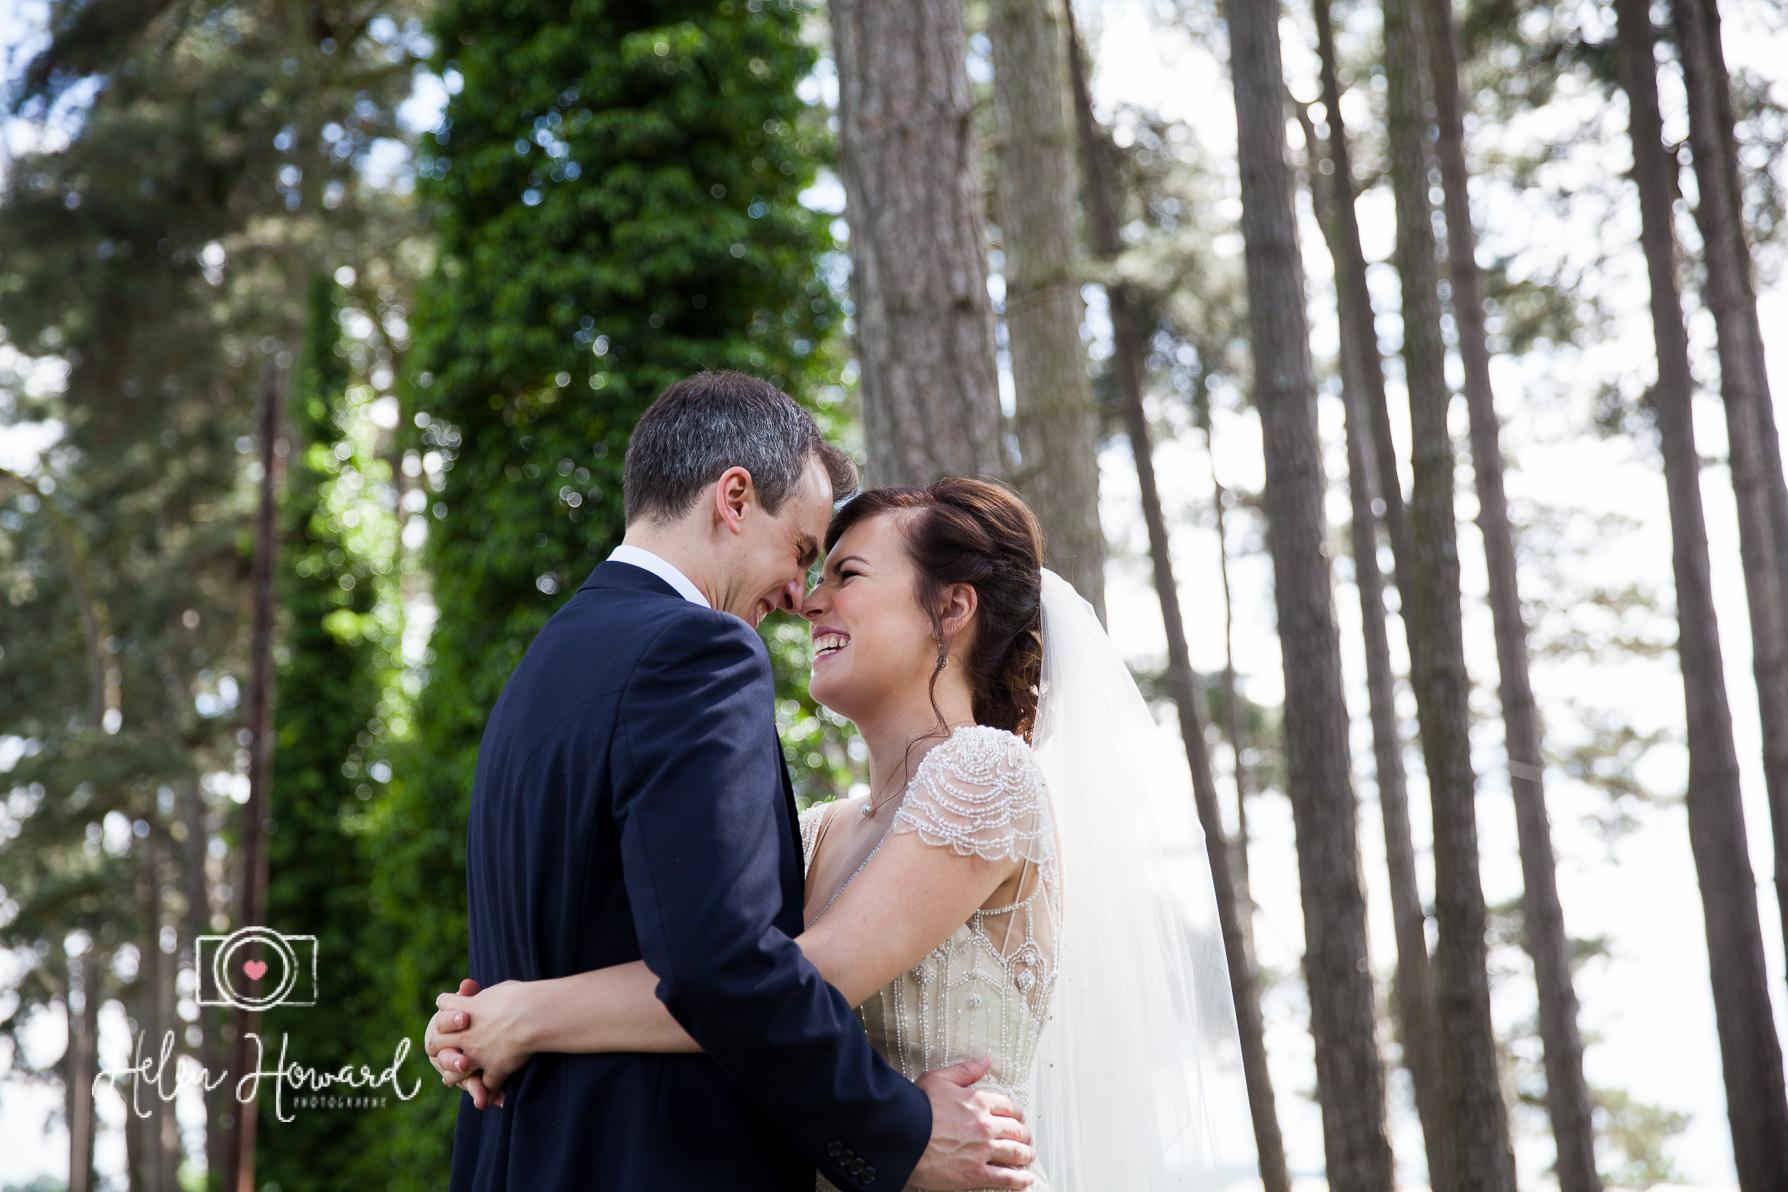 Helen Howard Photography Packington Moor Wedding-77.jpg